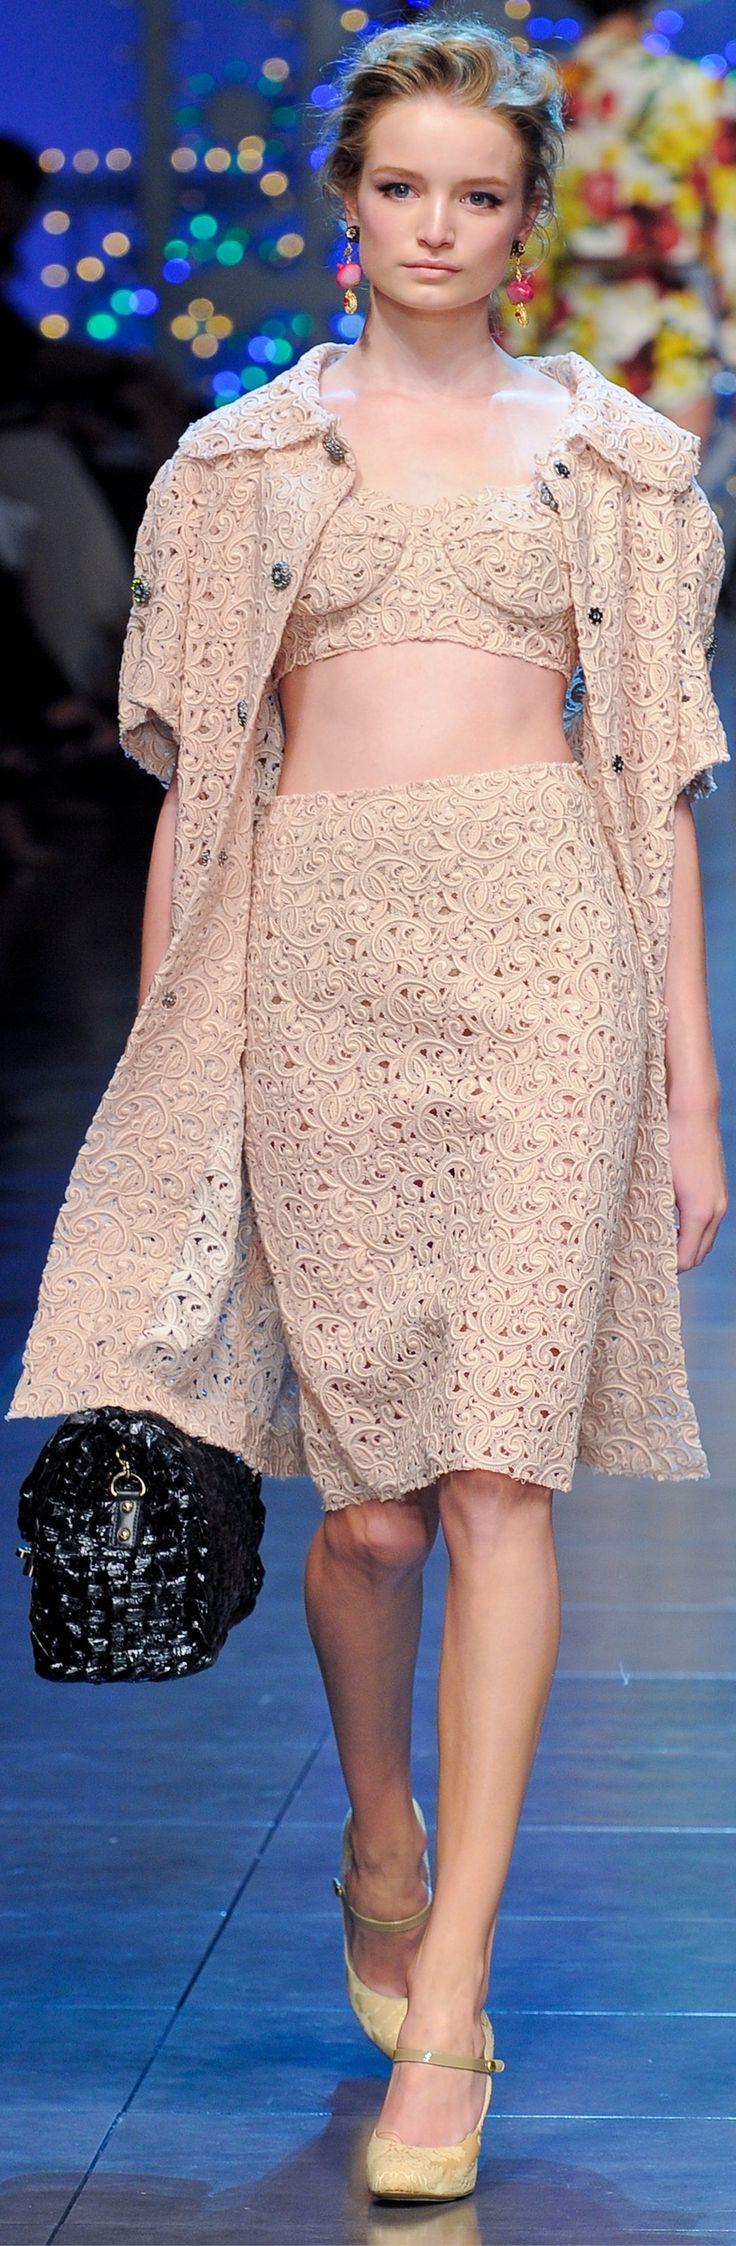 Dolce & Gabbana spring 2012.